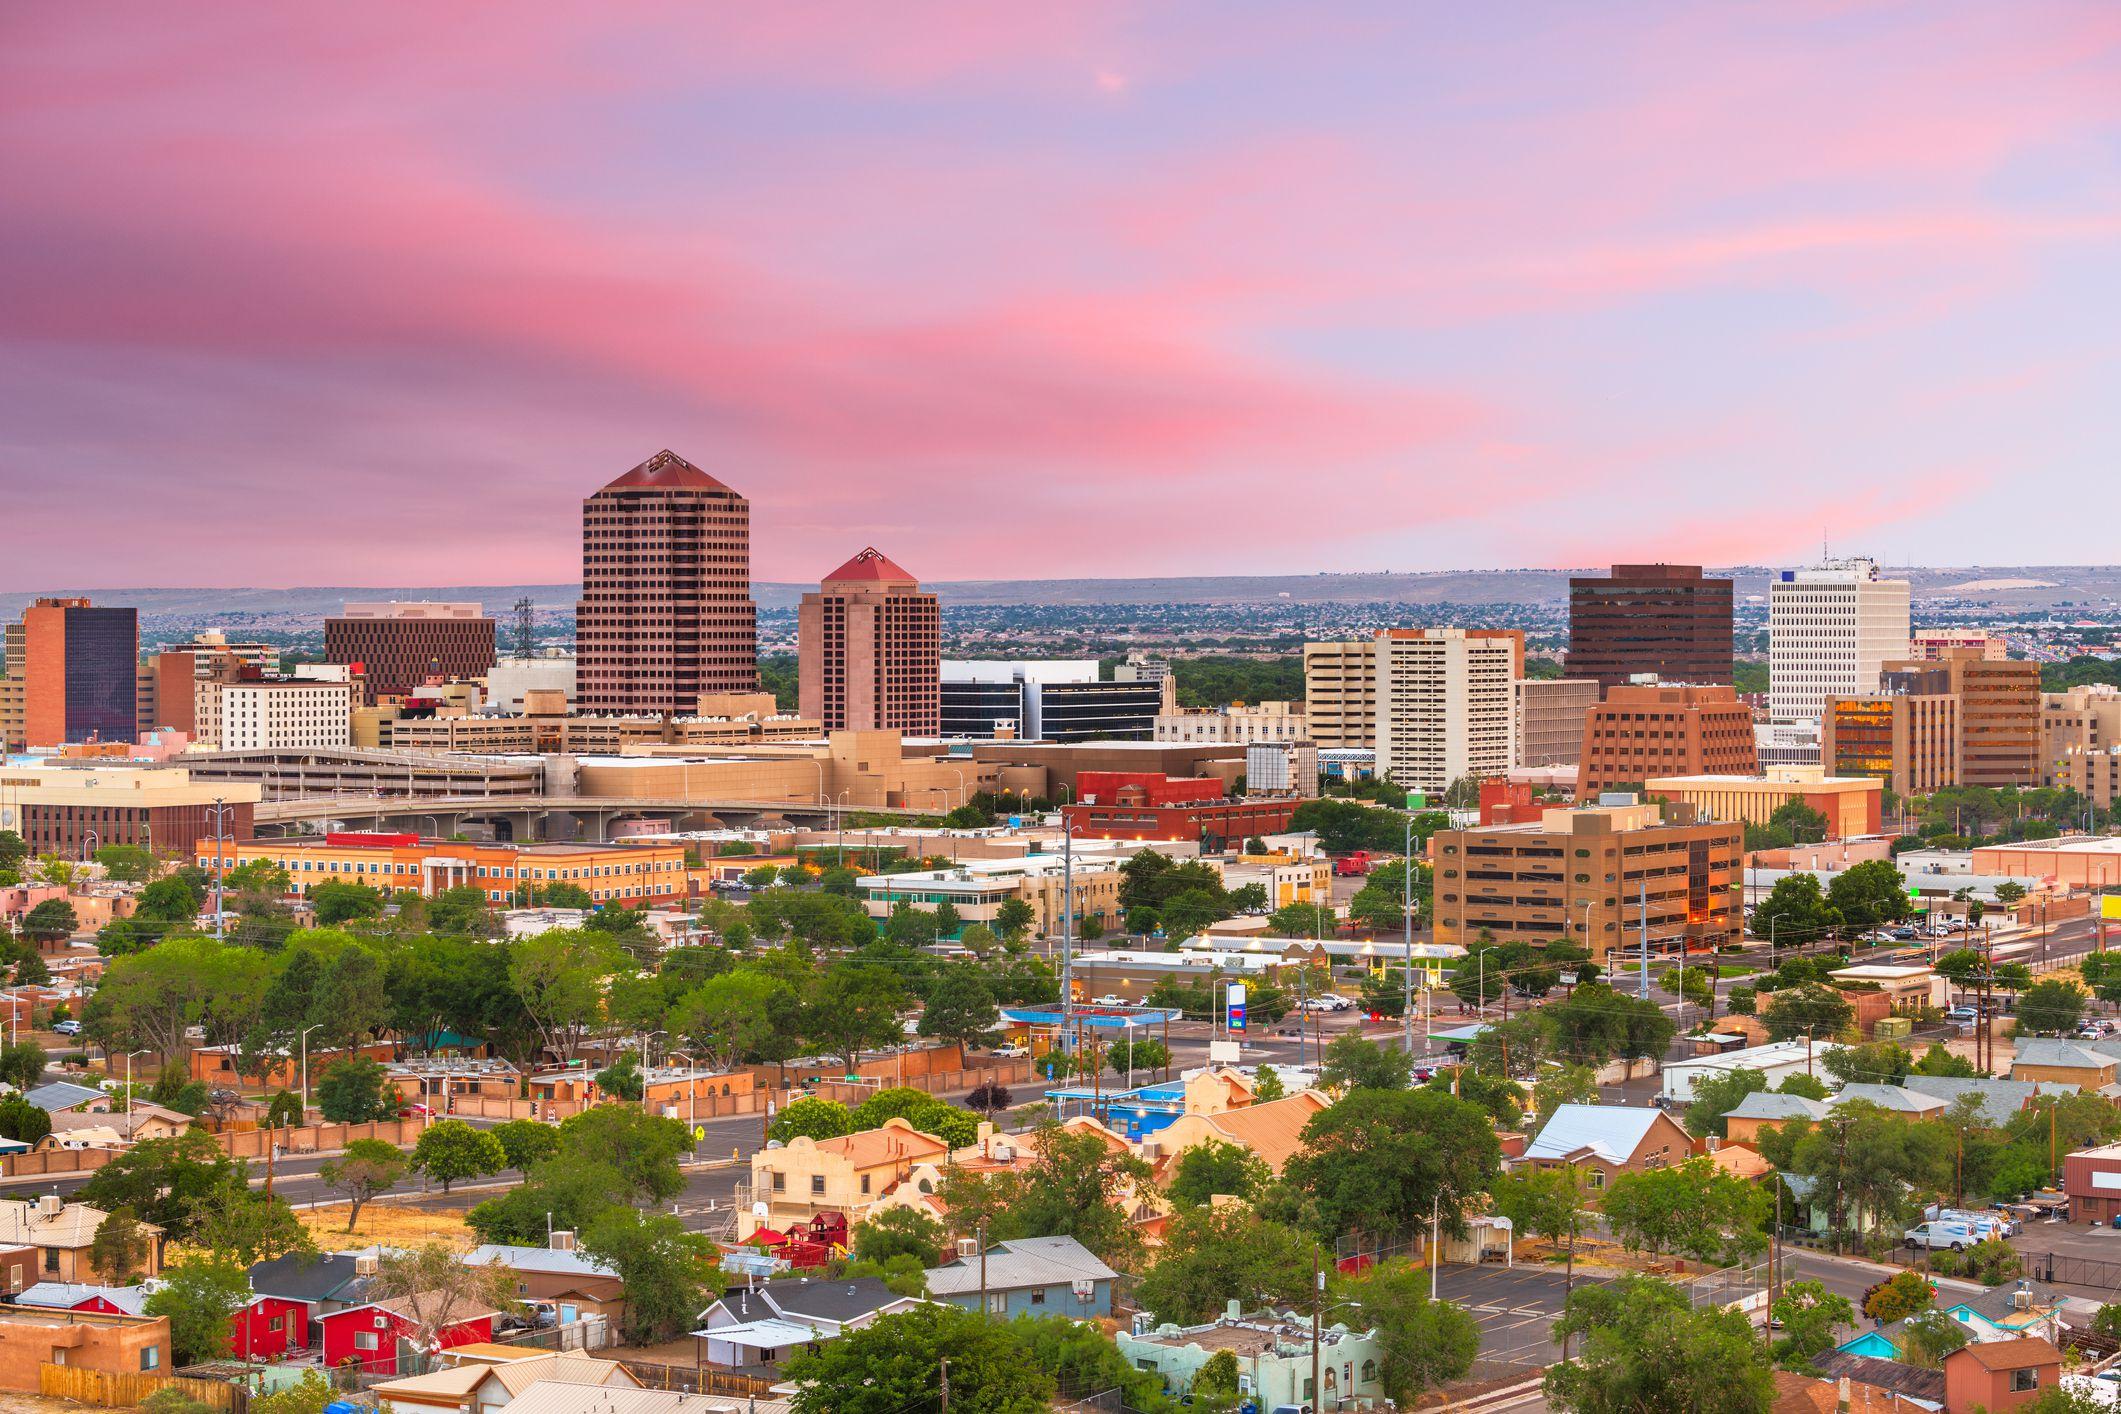 Senior Health Benefits Advisor - Albuquerque, NM - The